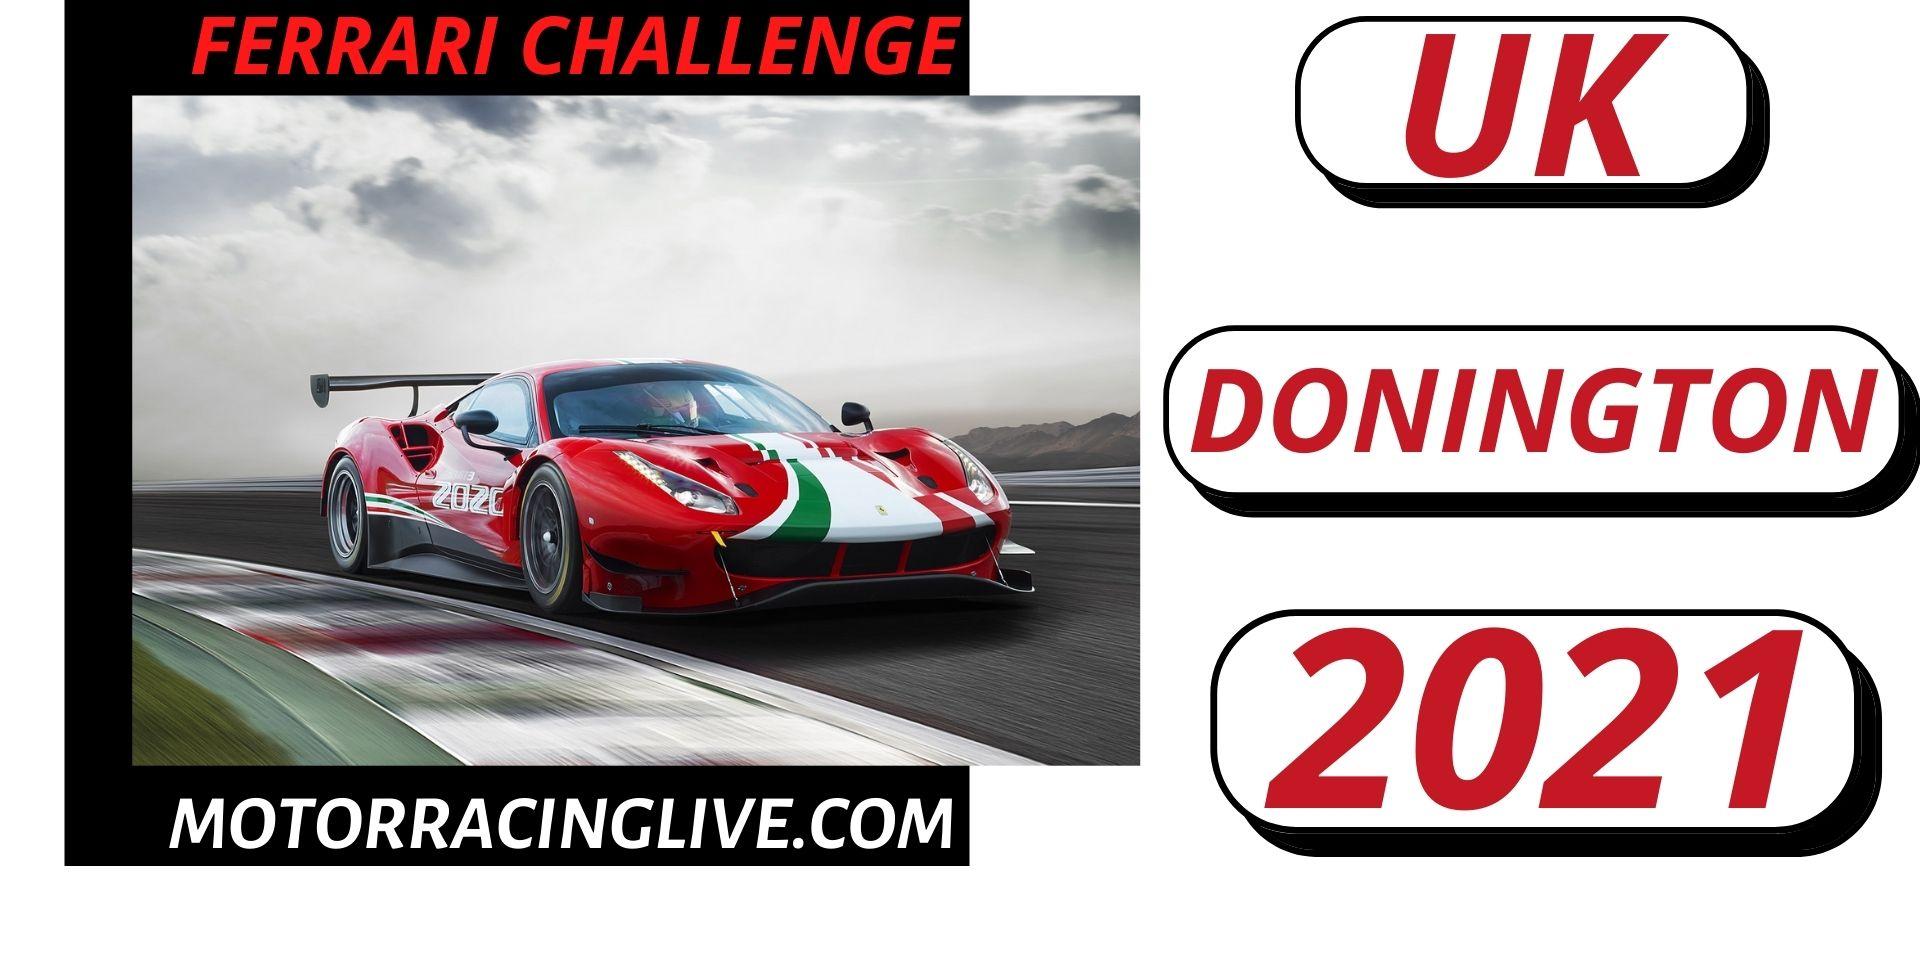 Donington Ferrari Challenge UK Live Stream 2021